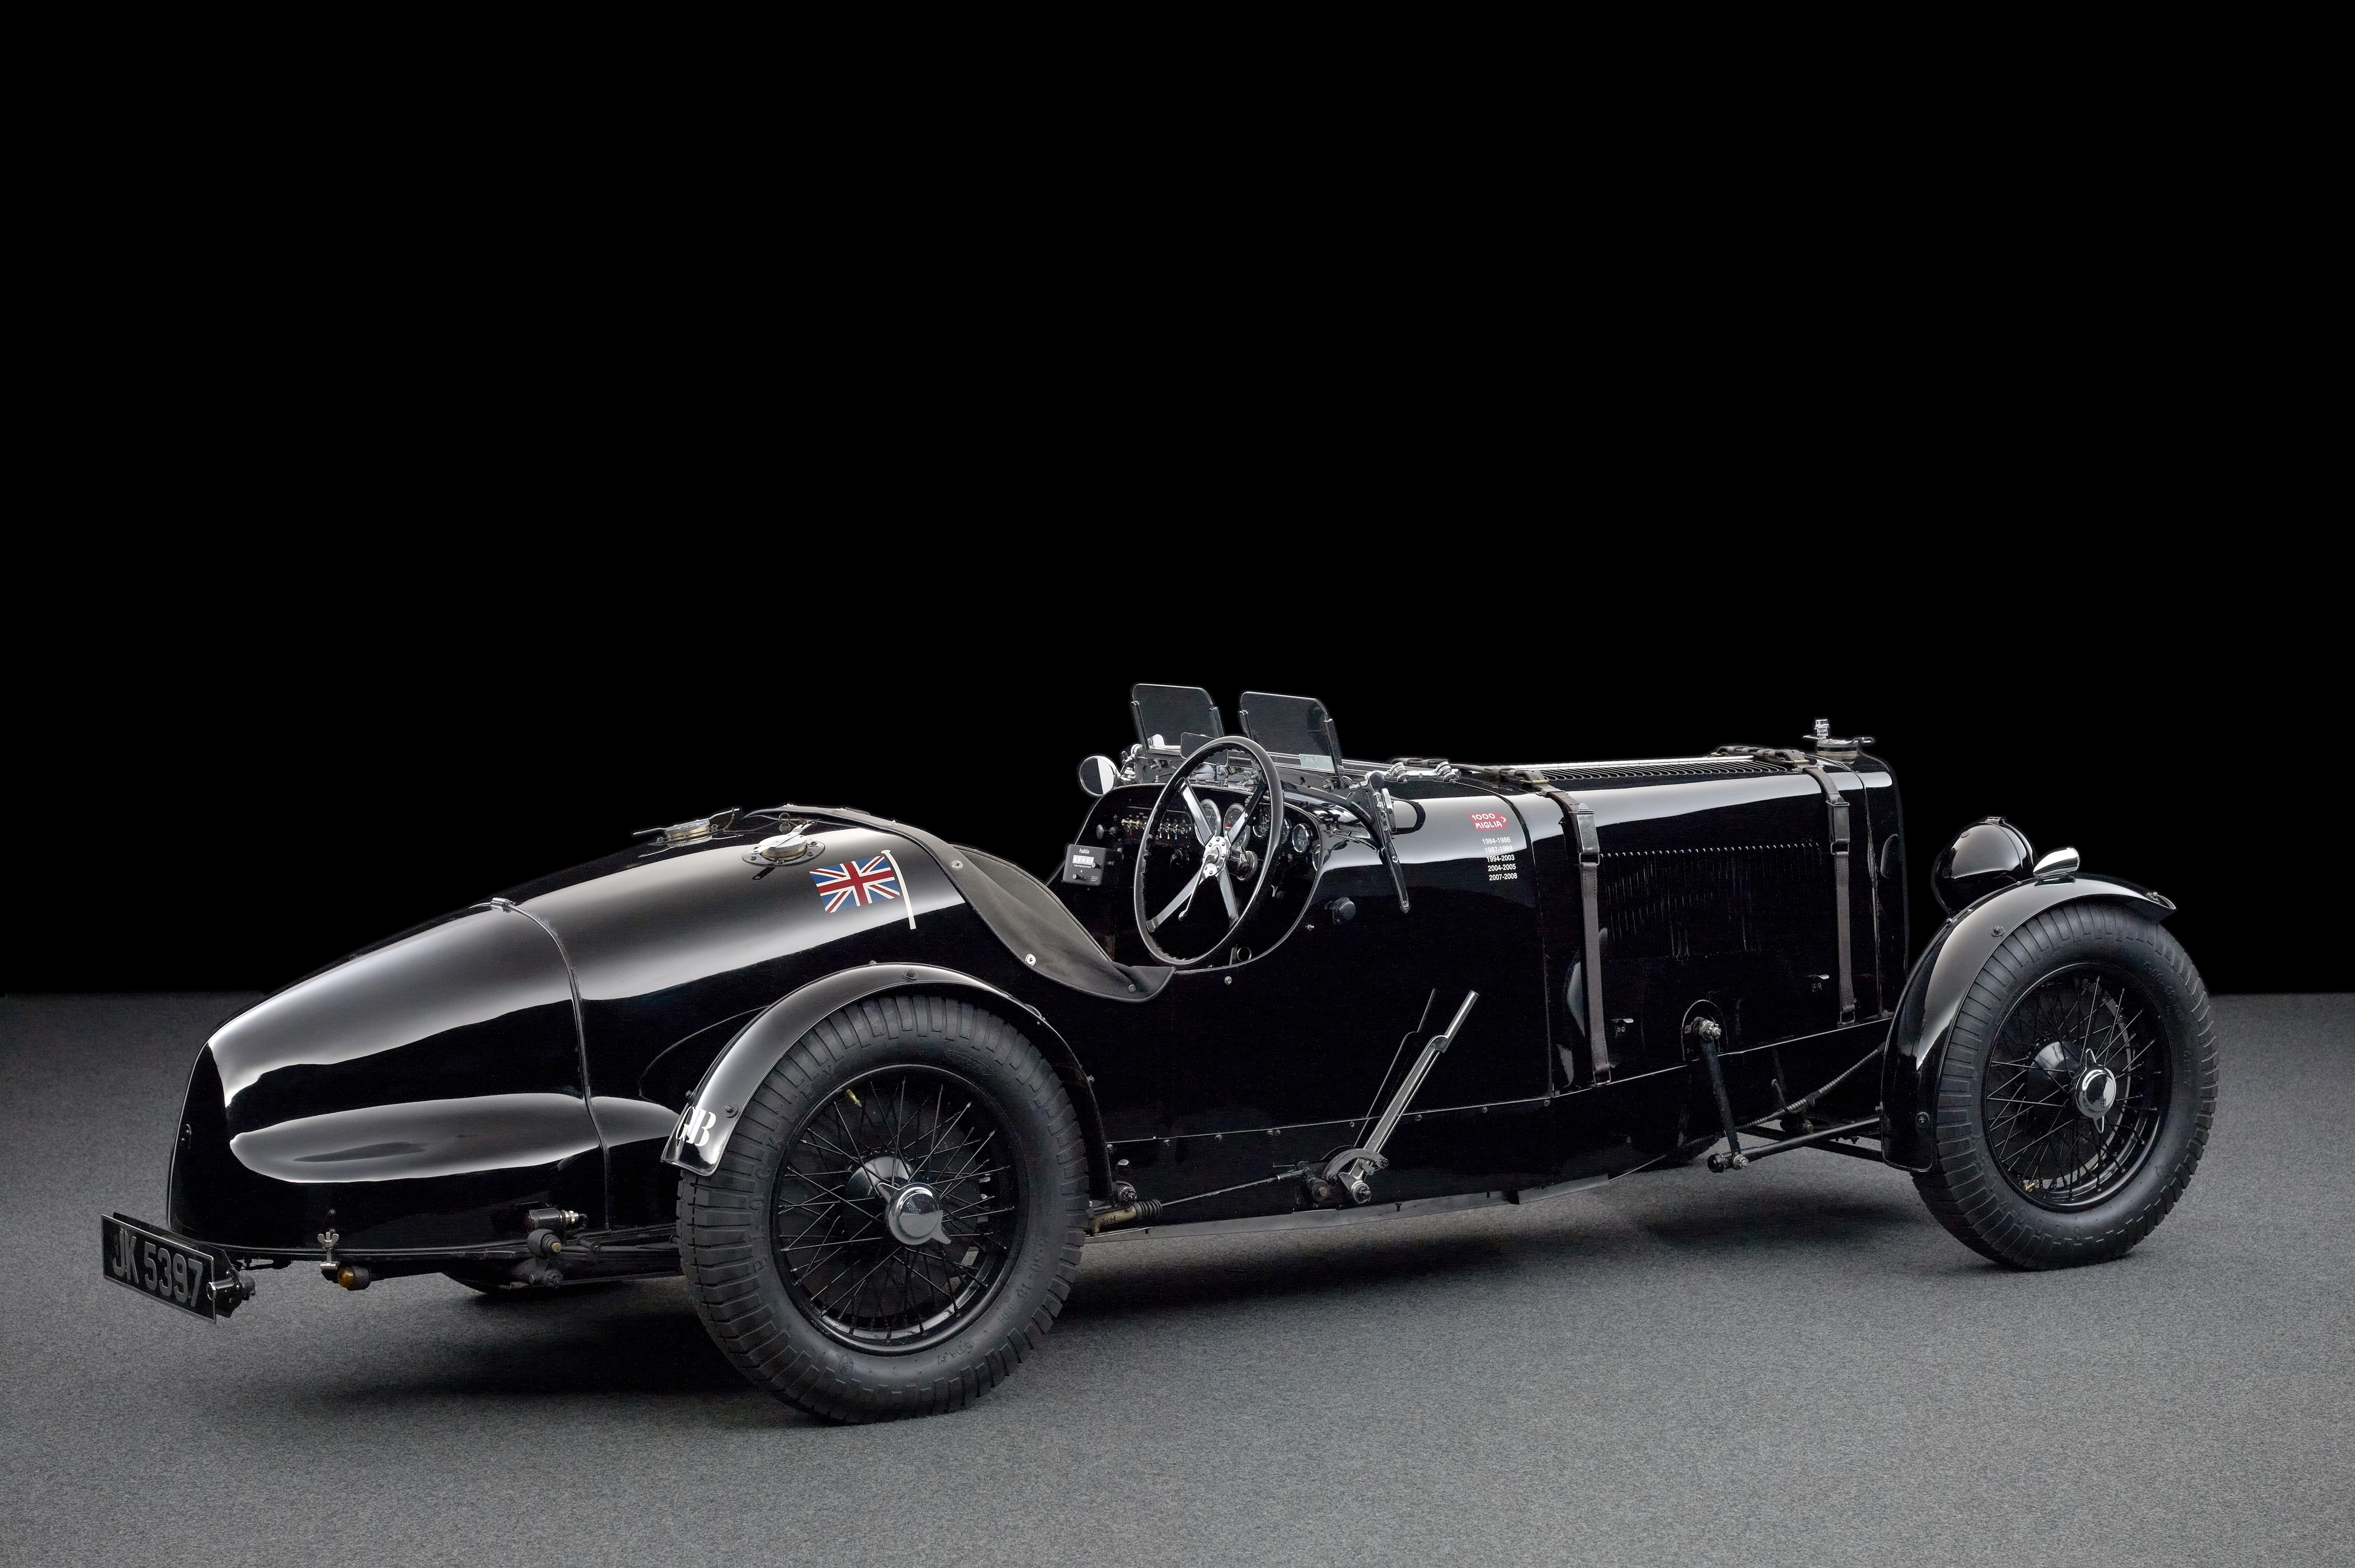 1936 Aston Martin Ulster Vintage Car For Sale